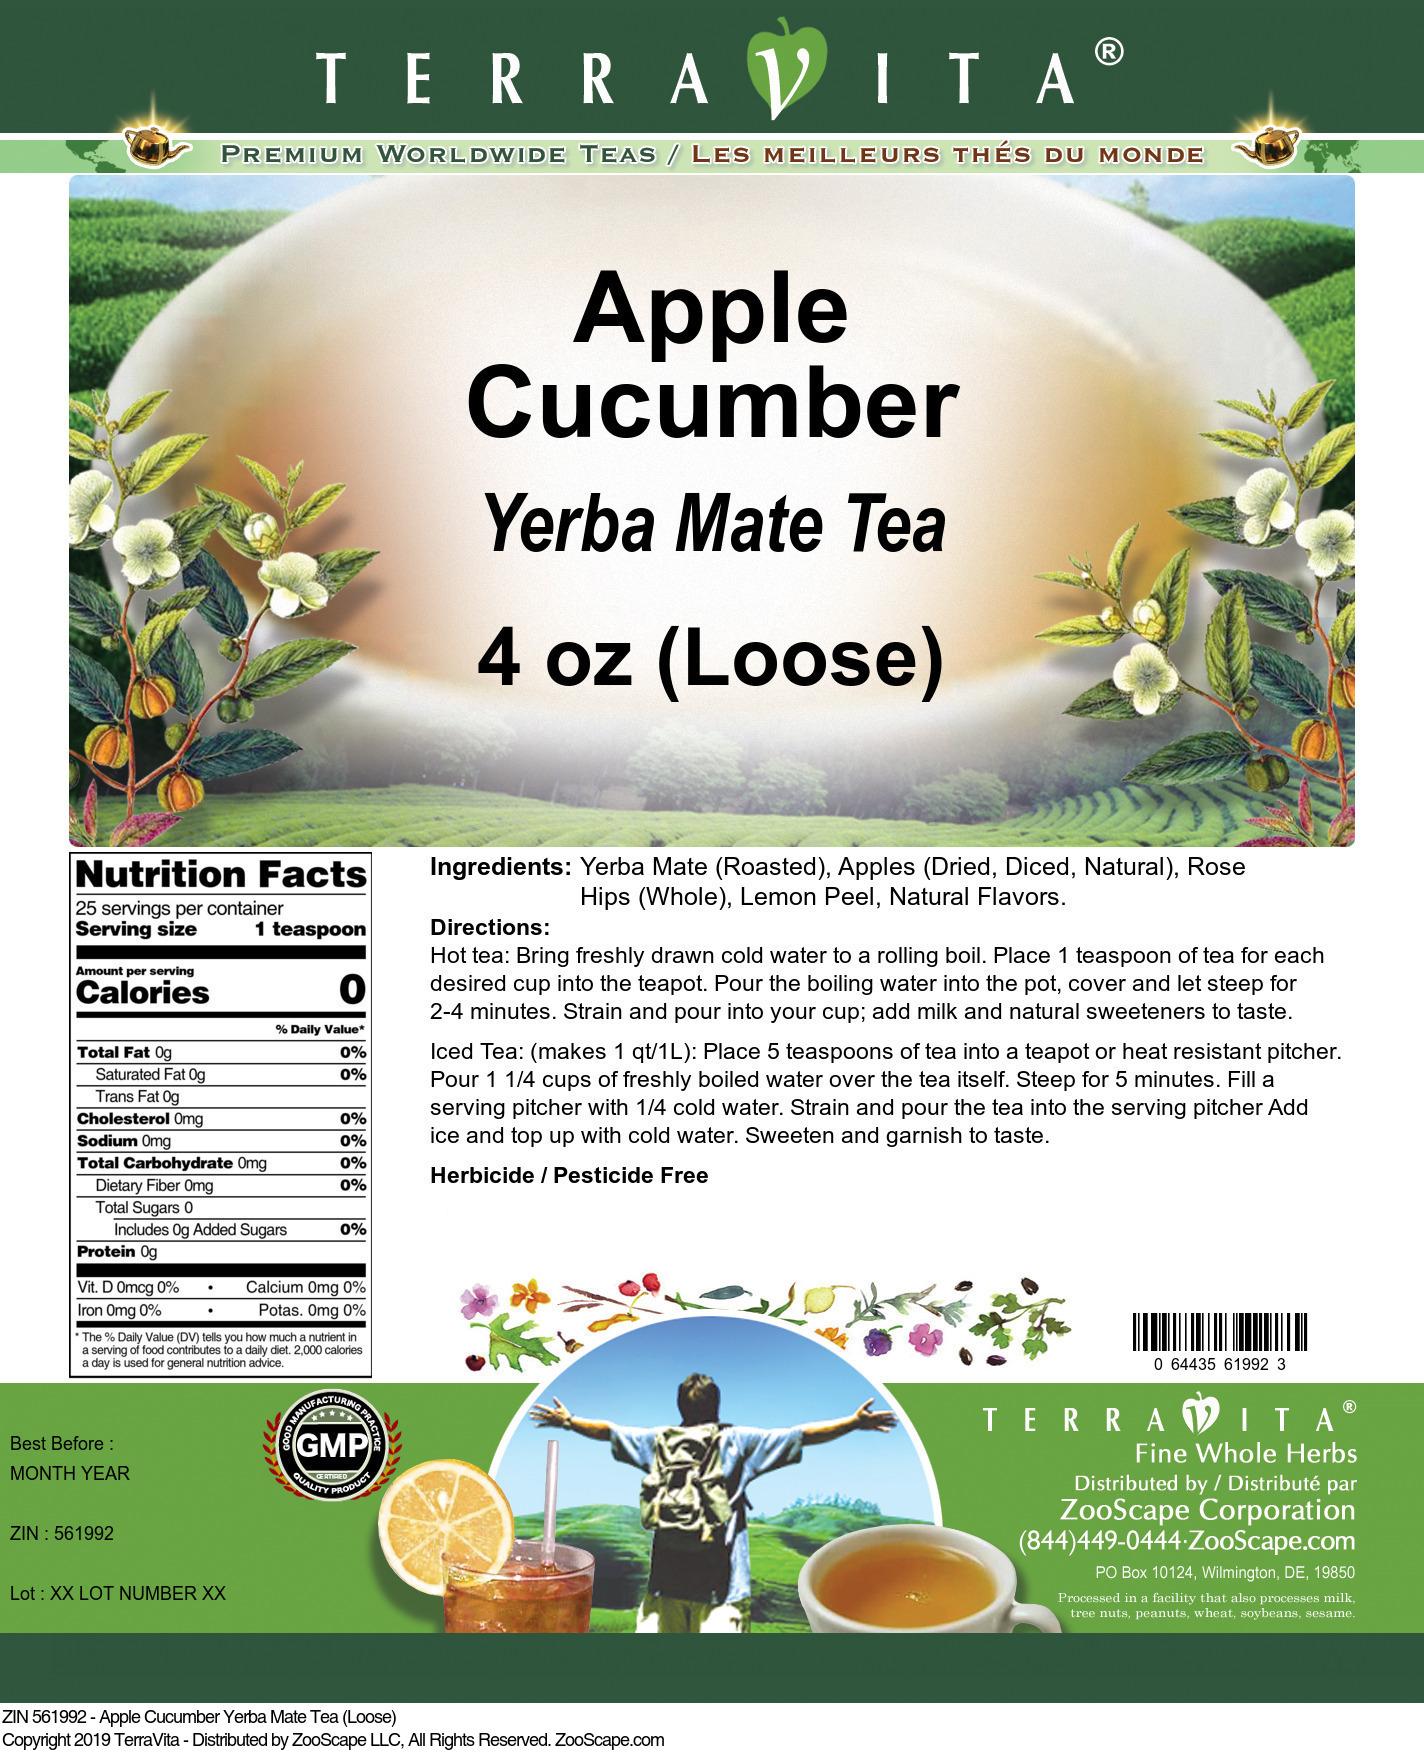 Apple Cucumber Yerba Mate